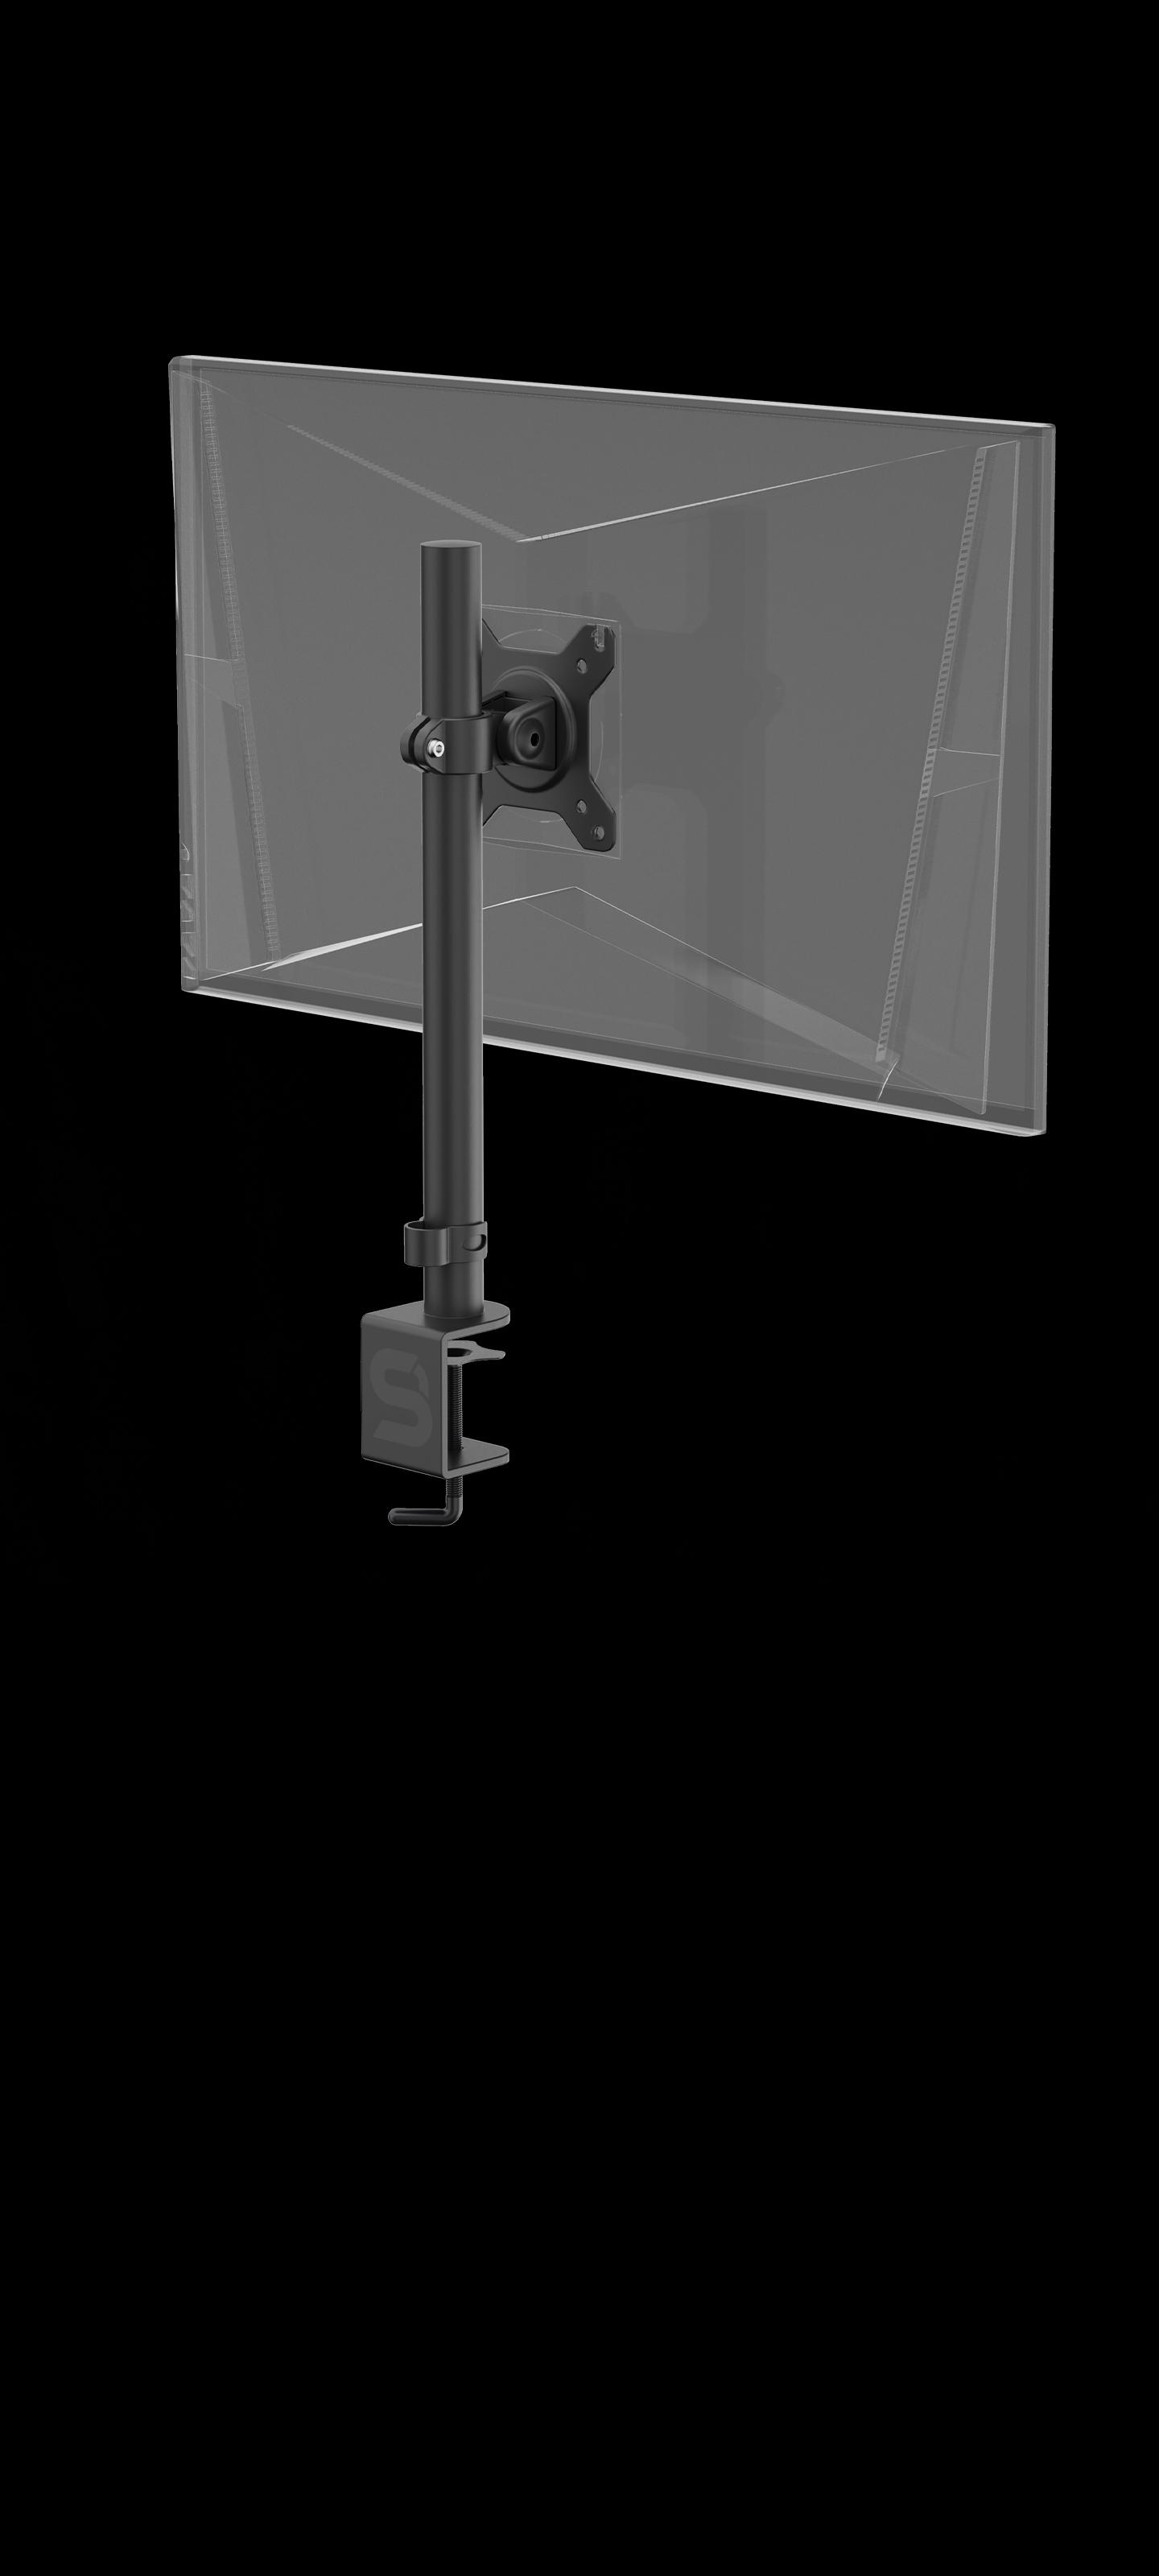 SPC Gear Atlas 100 display mount